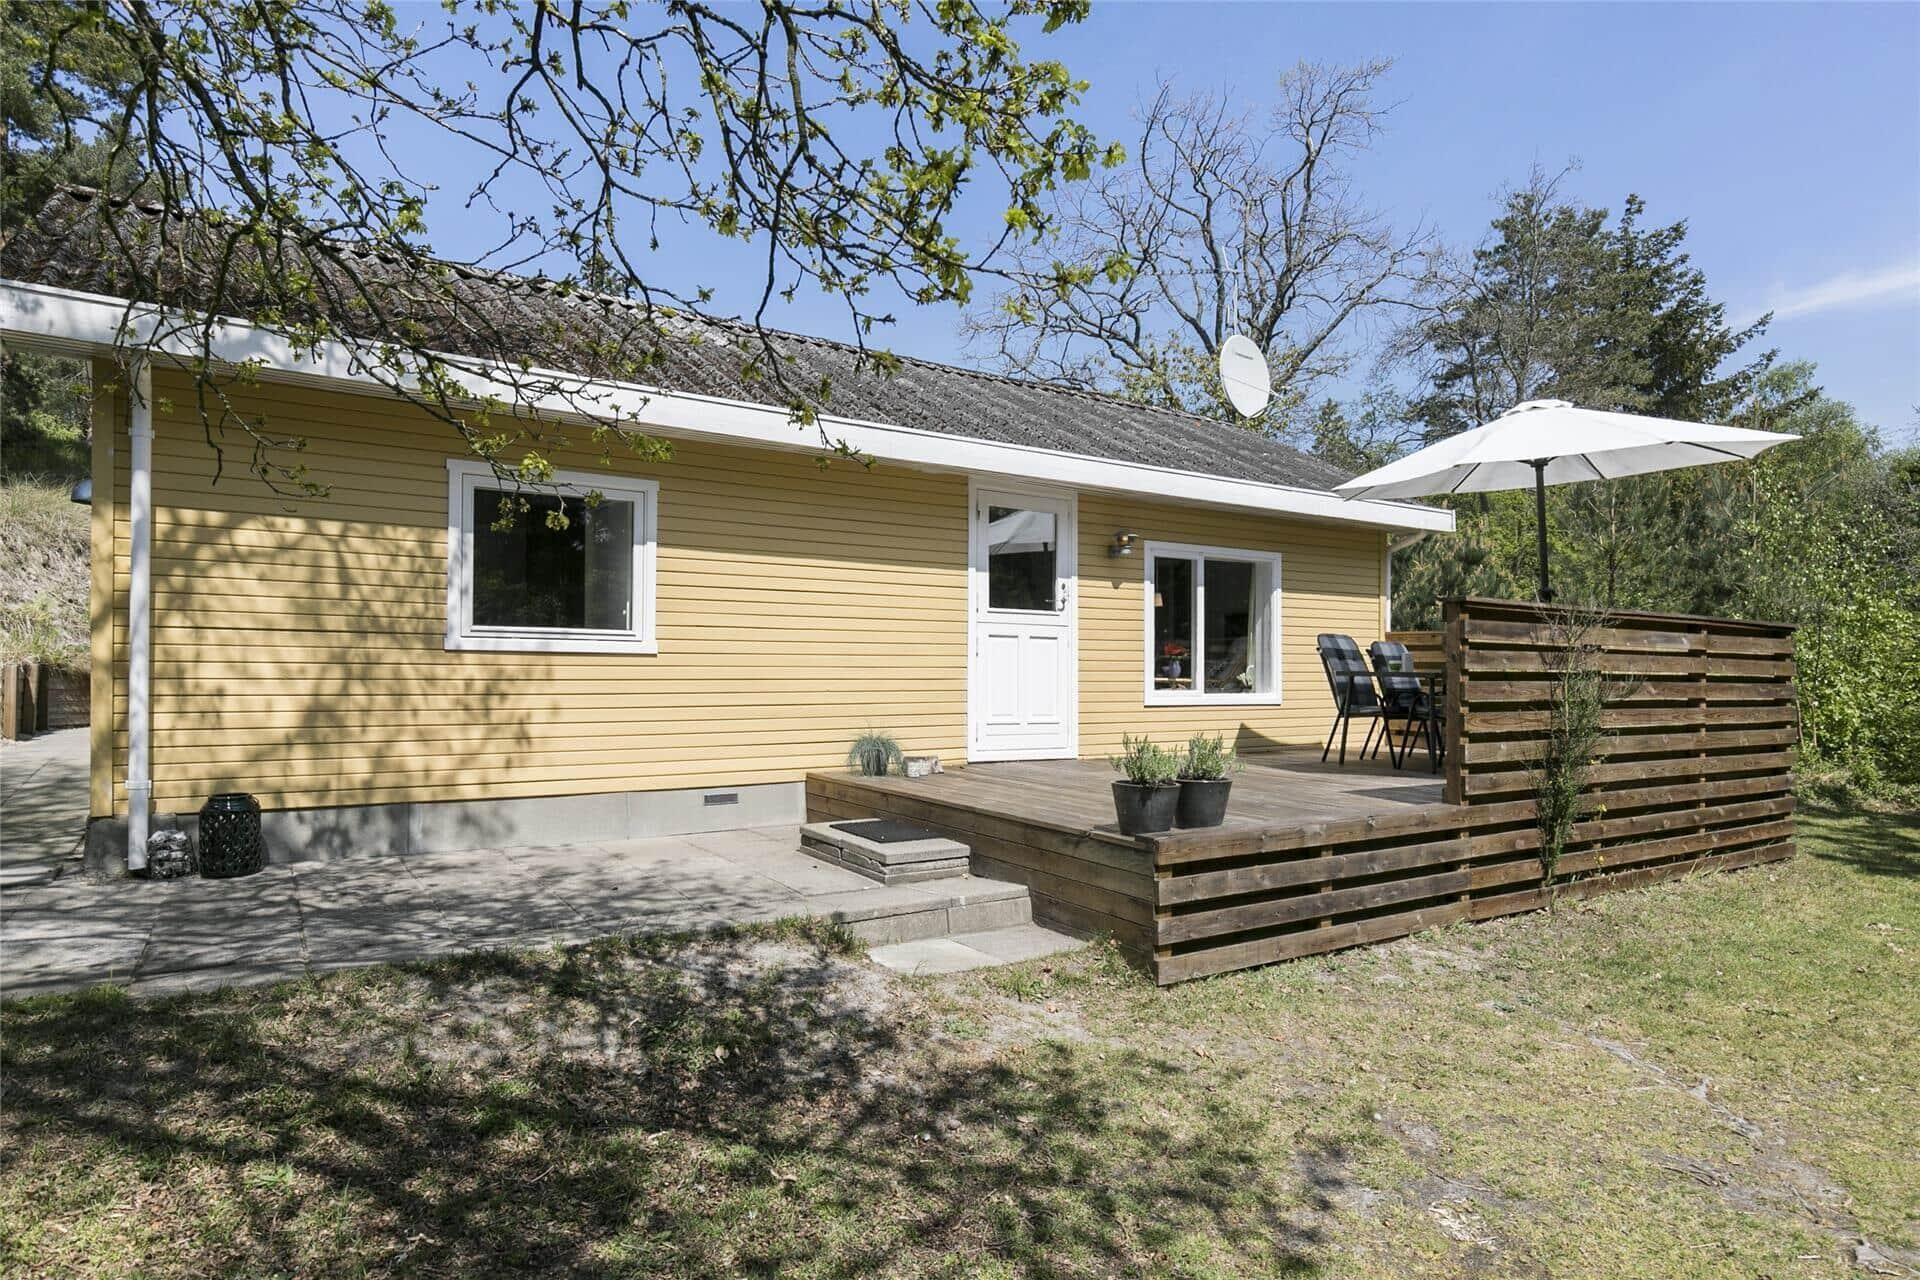 Billede 1-10 Sommerhus 1504, Lyngvejen 5, DK - 3720 Aakirkeby